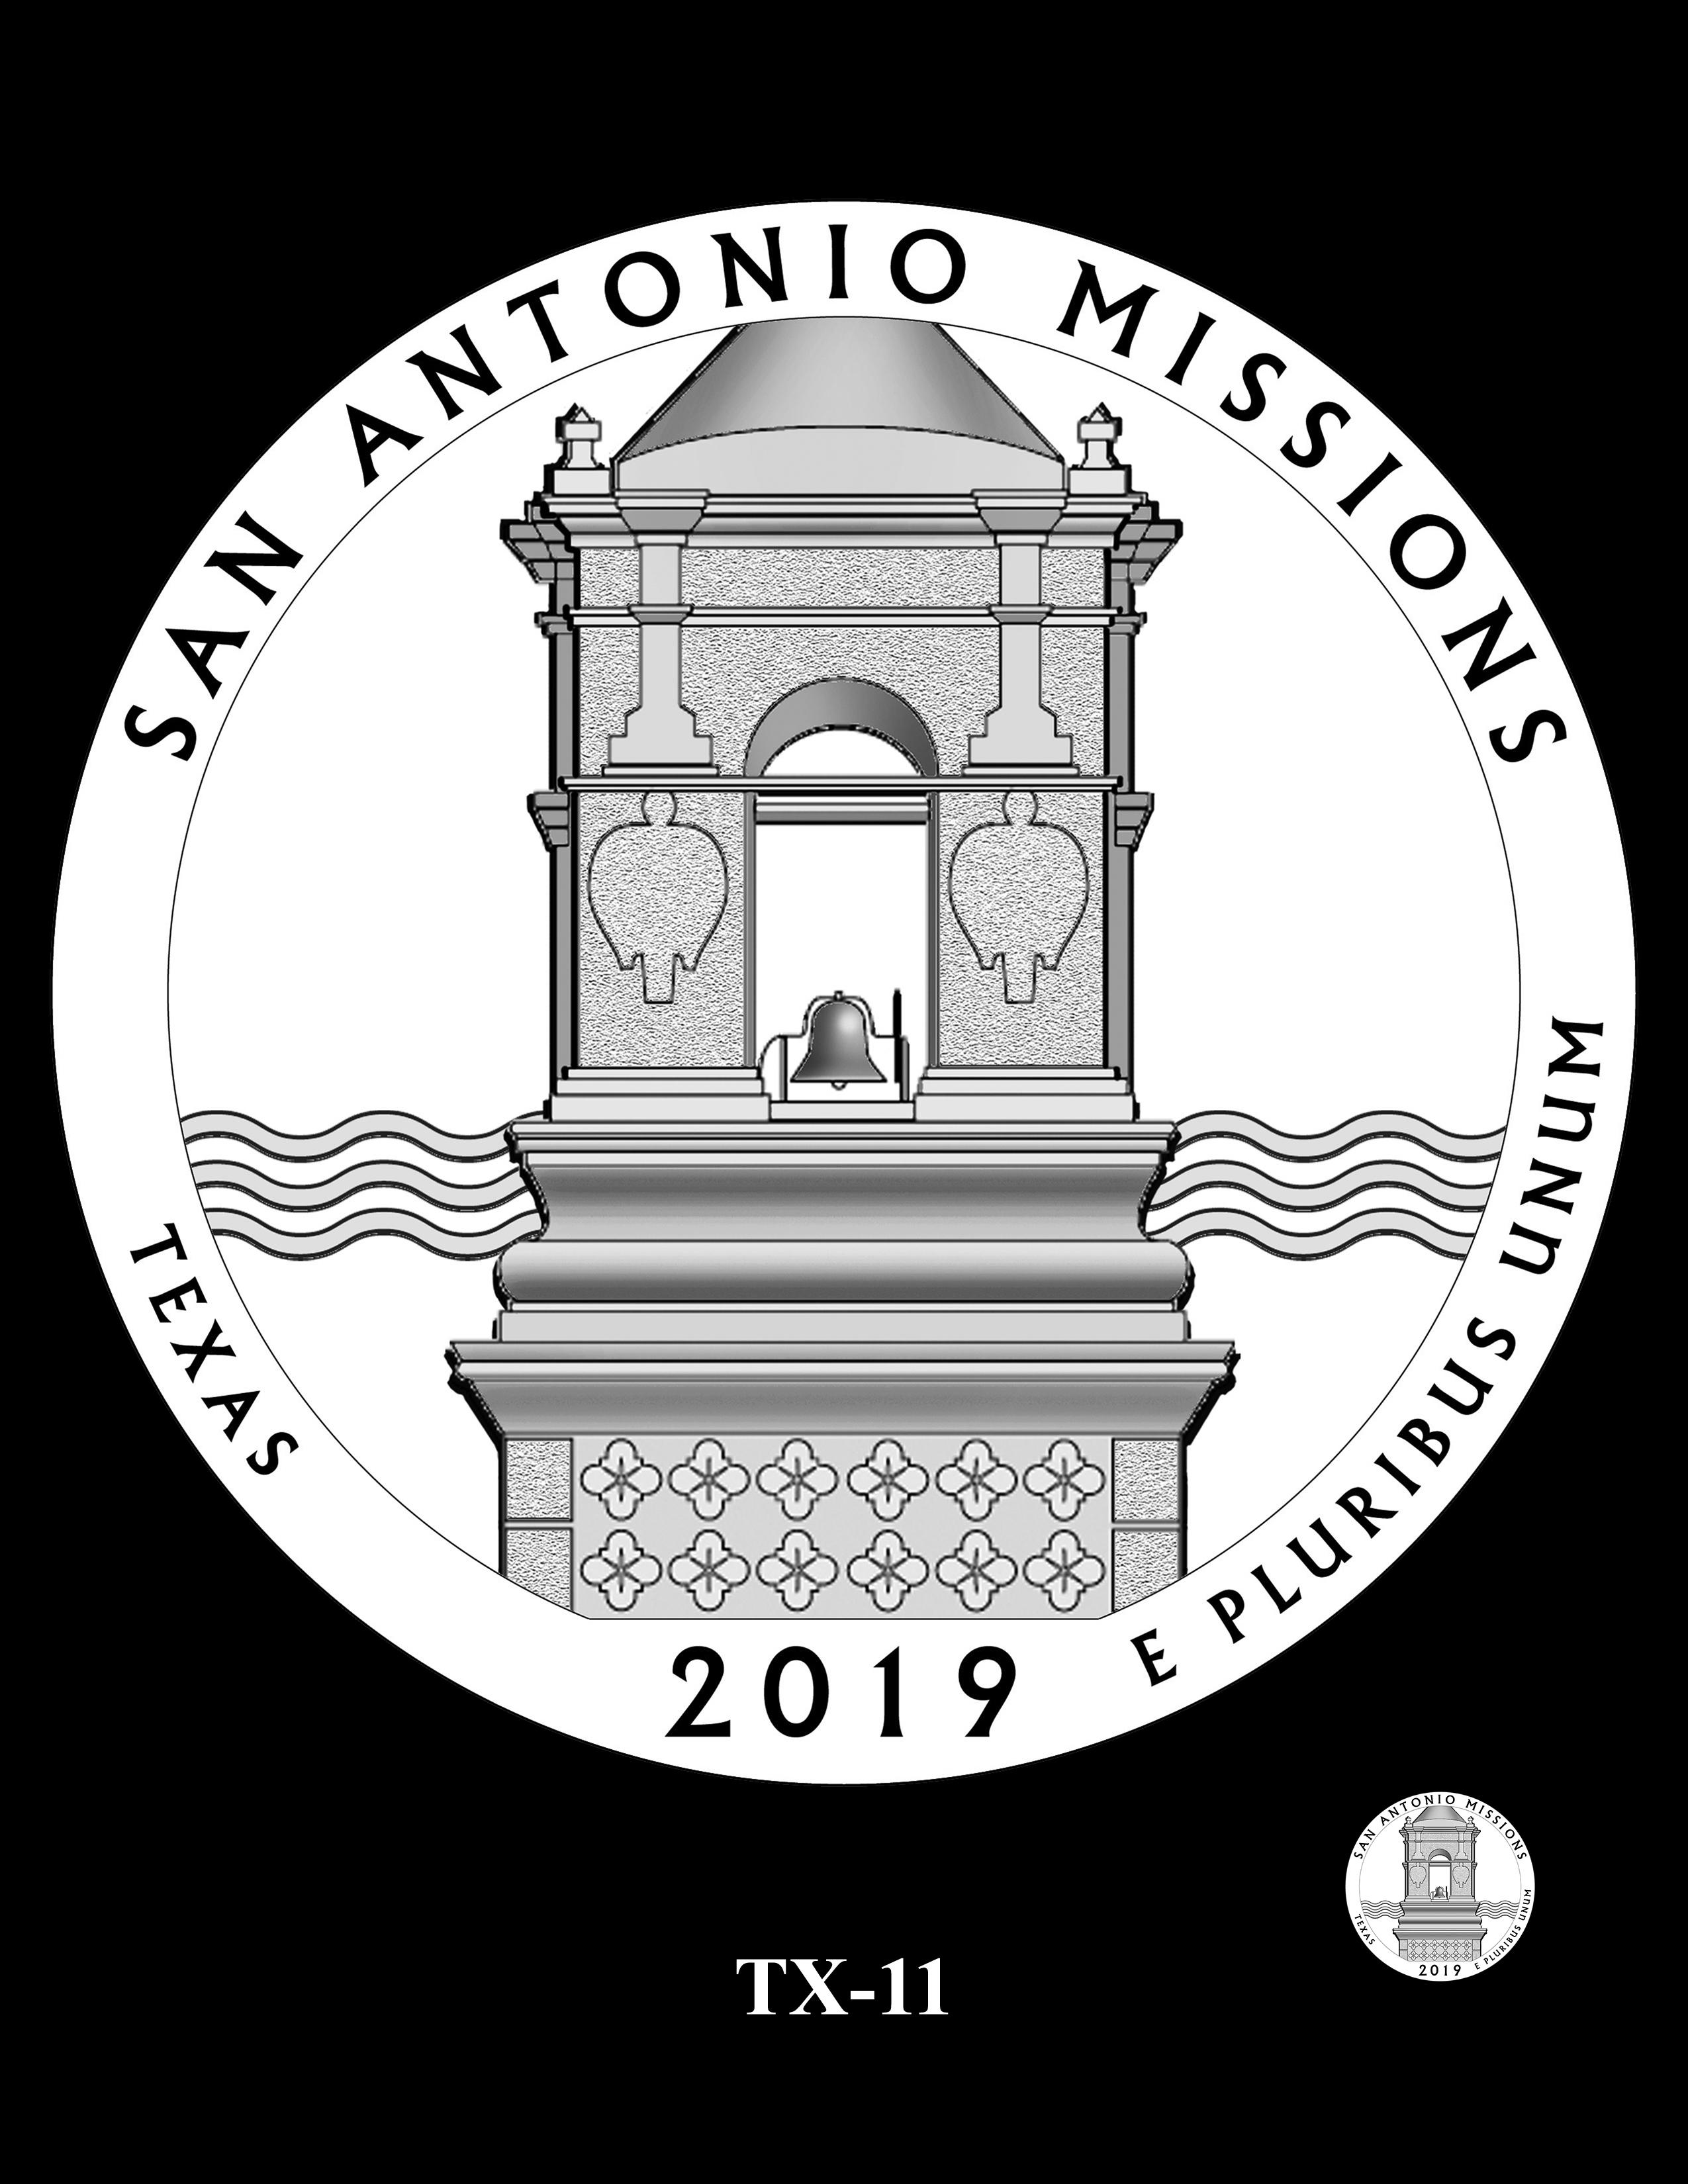 TX-11 -- 2019 America the Beautiful Quarters® Program